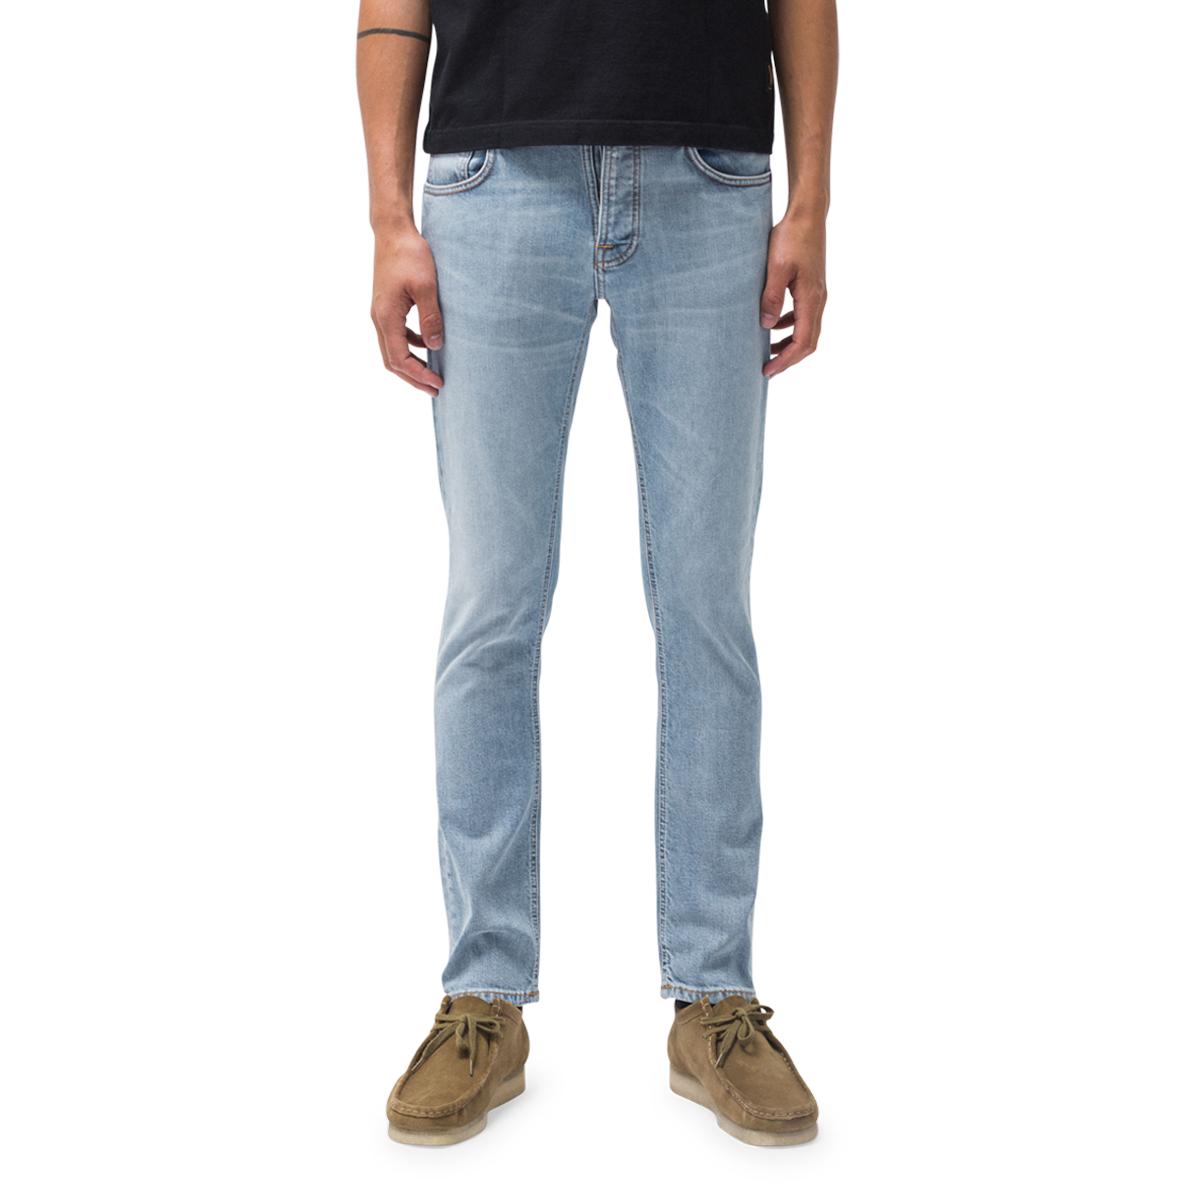 Nudie Jeans Co Lean Dean Light Stone Comfort L32